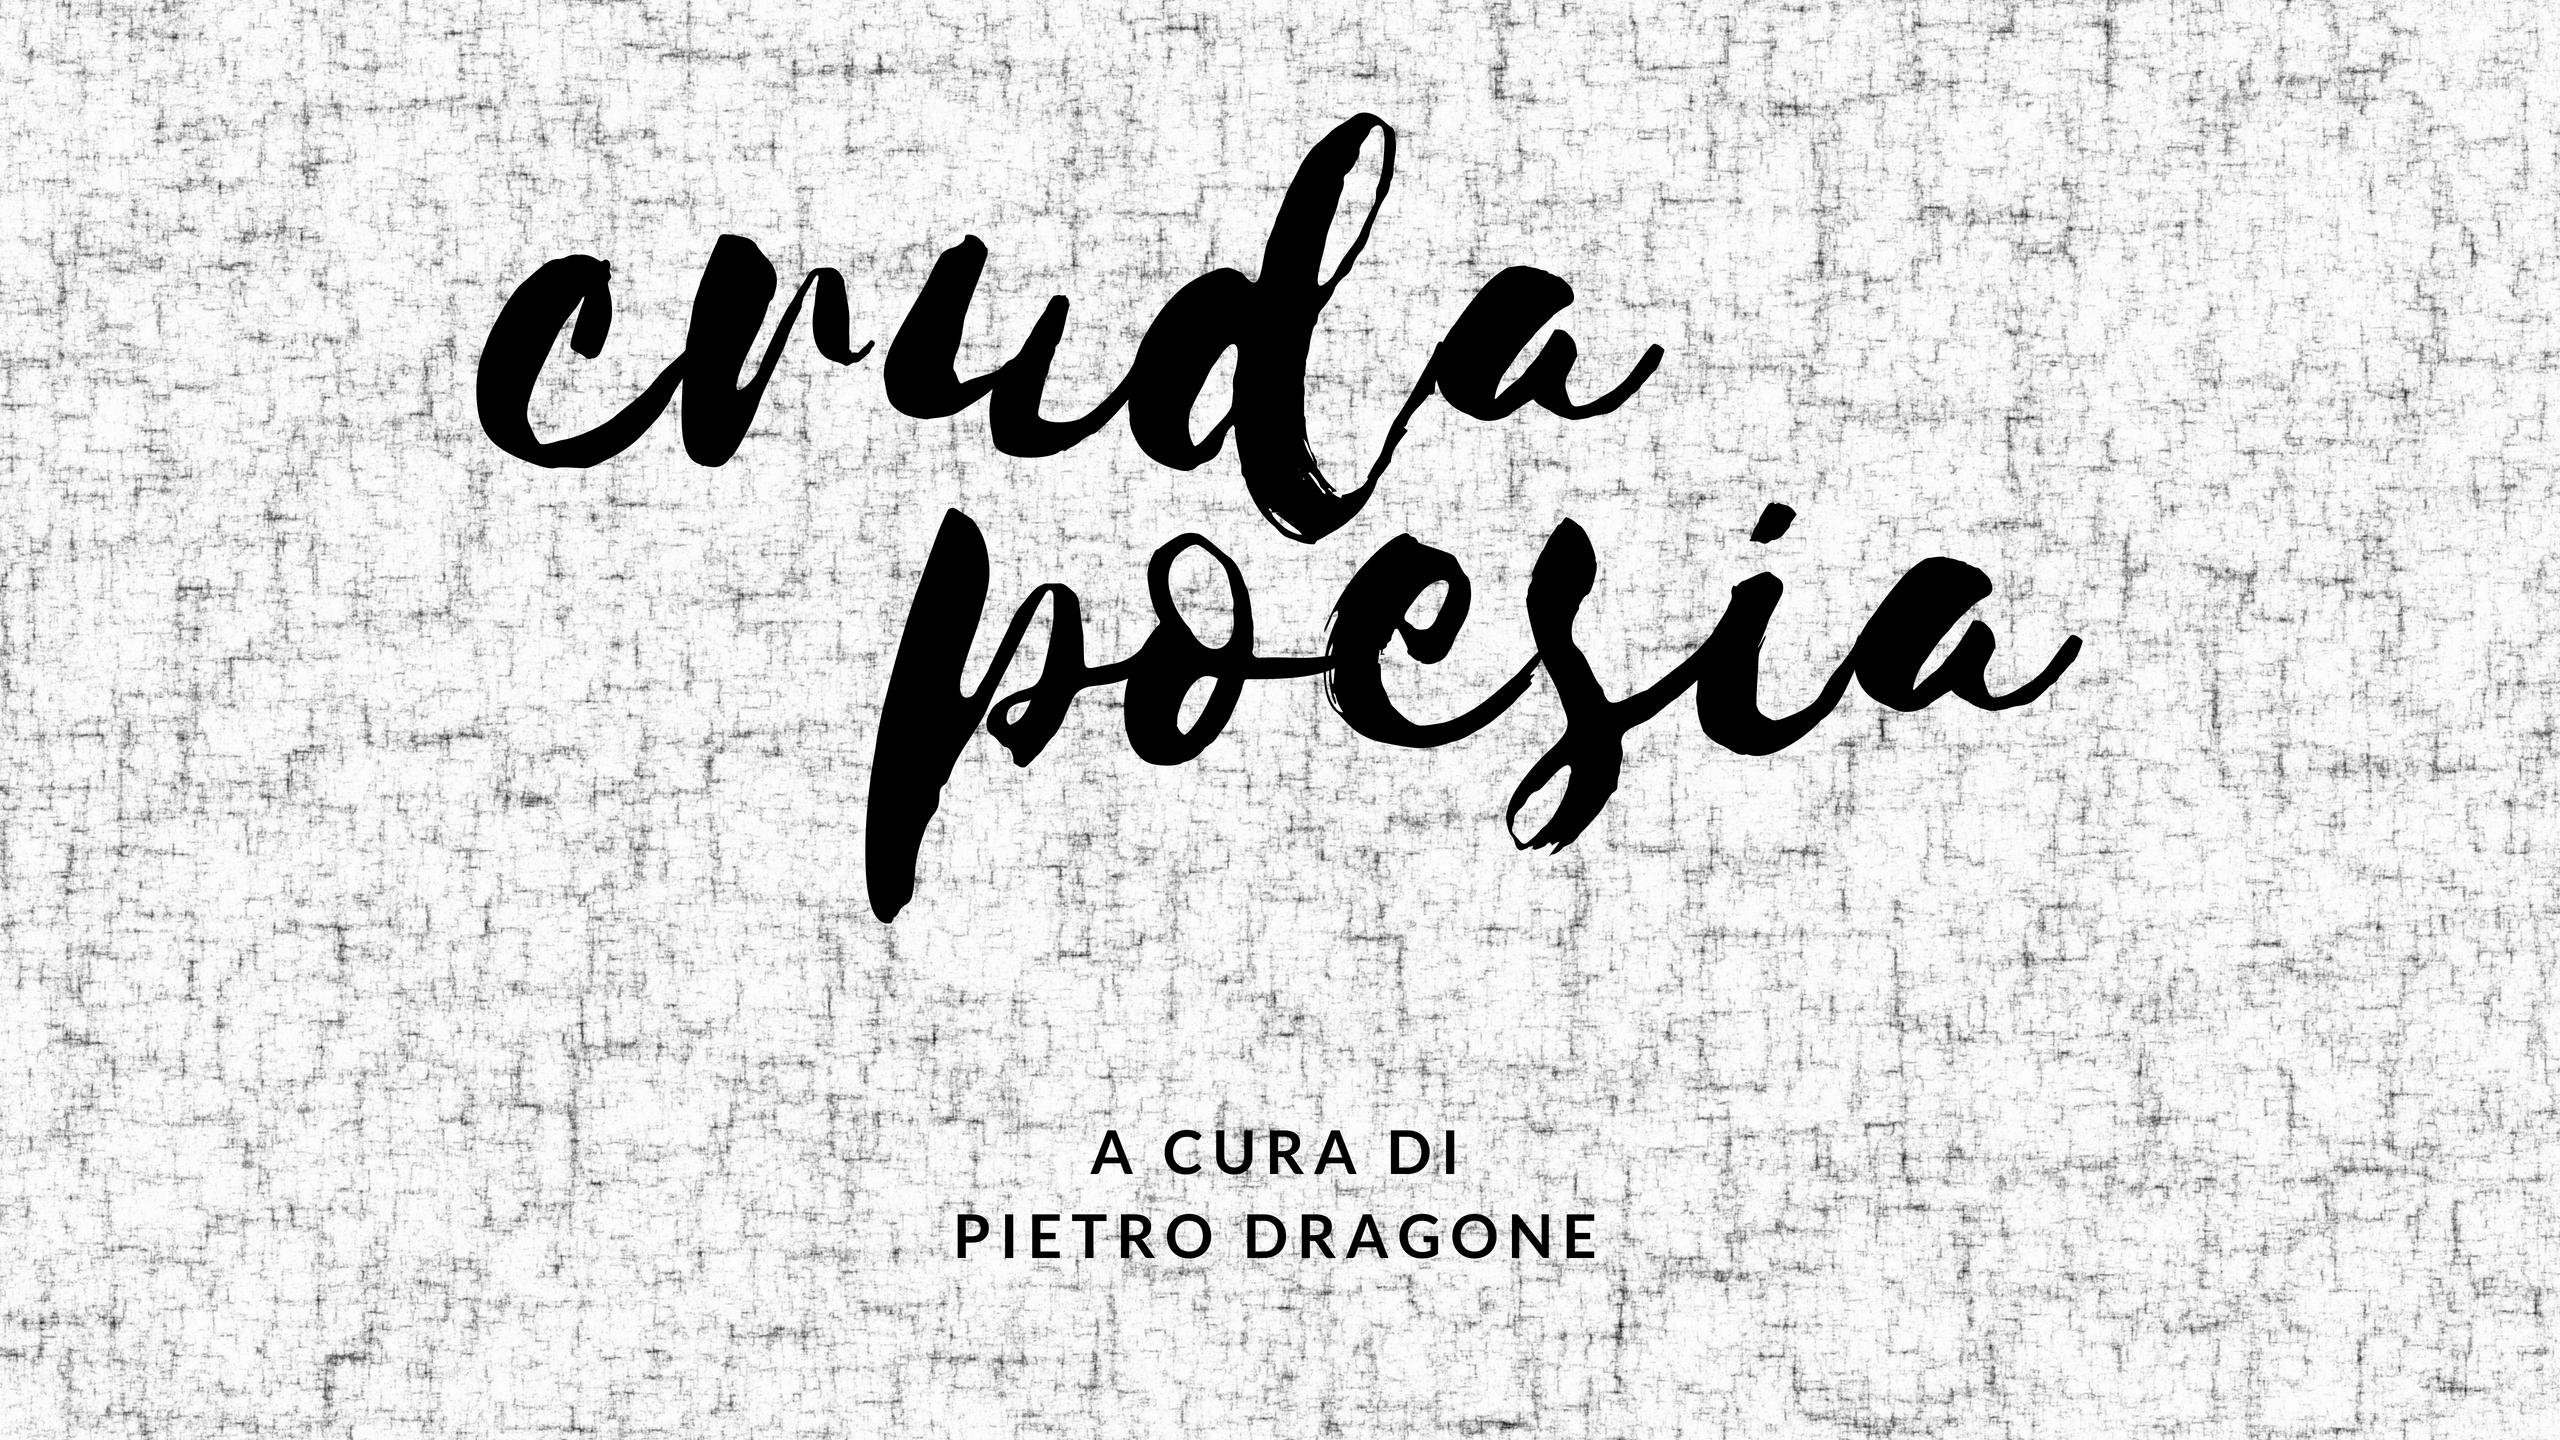 """CRUDA POESIA"": ECCO COME PROCEDERÒ"